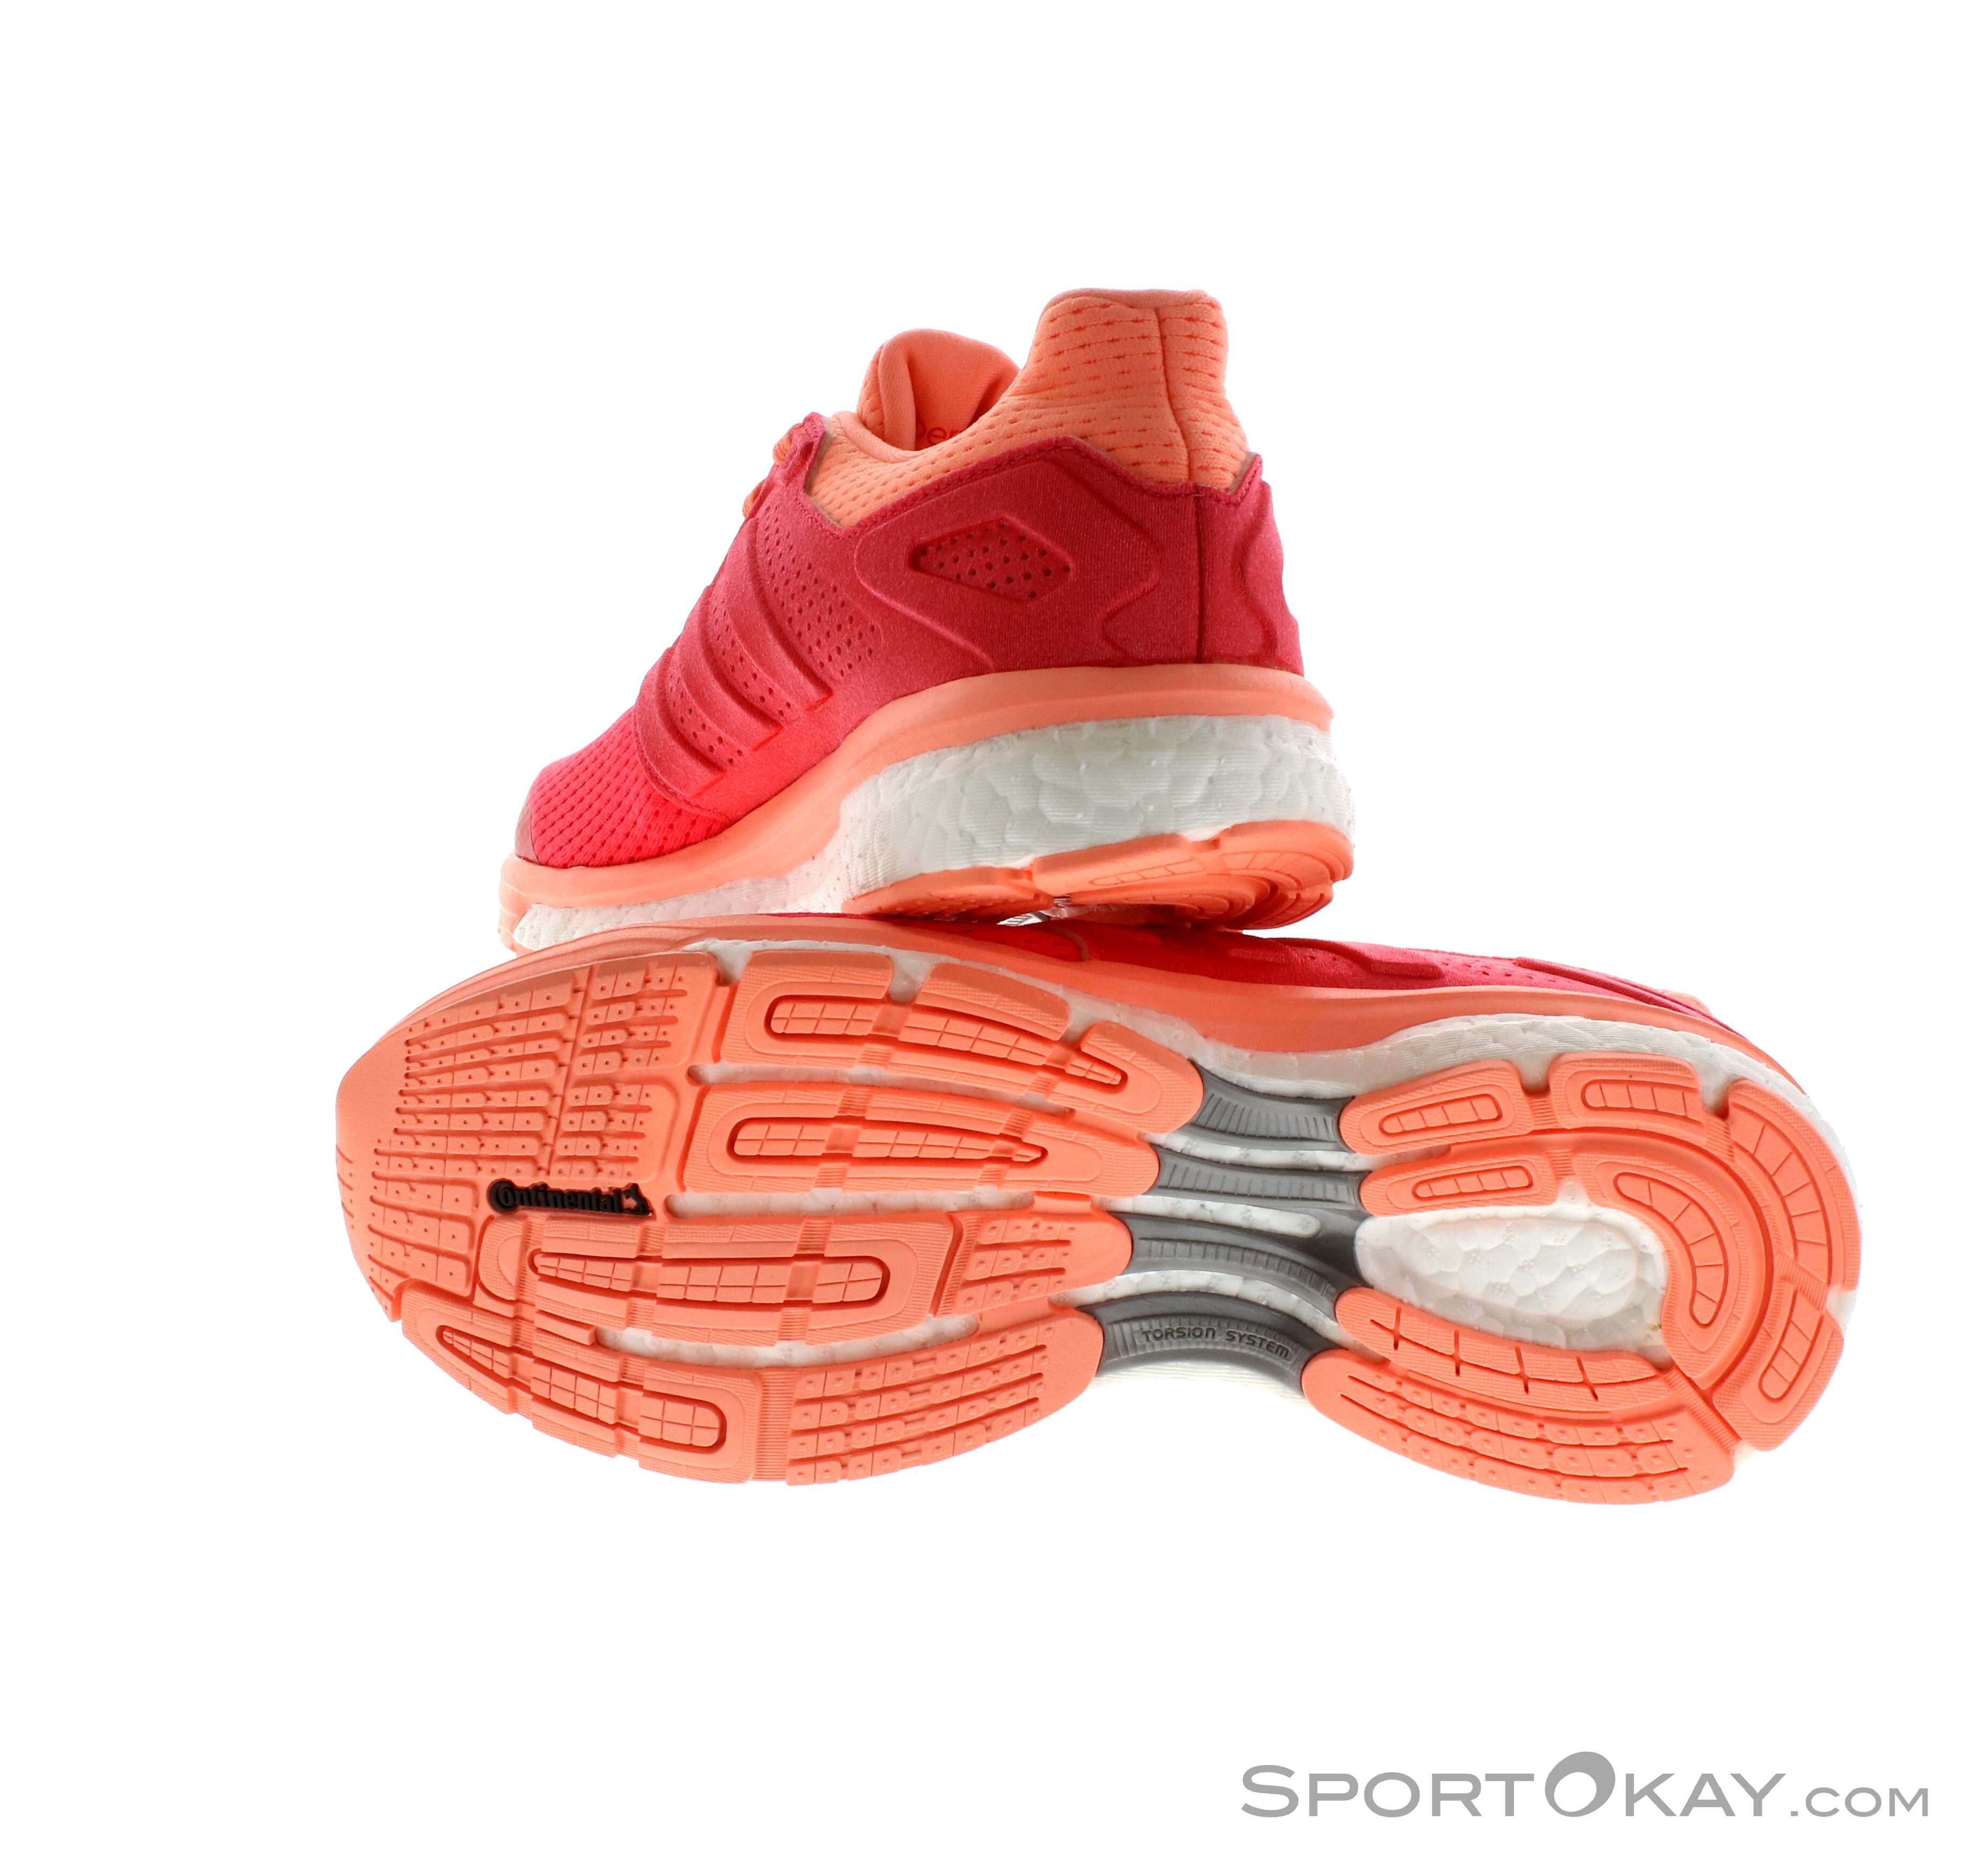 adidas adidas Supernova Glide Boost 8 W Damen Laufschuhe